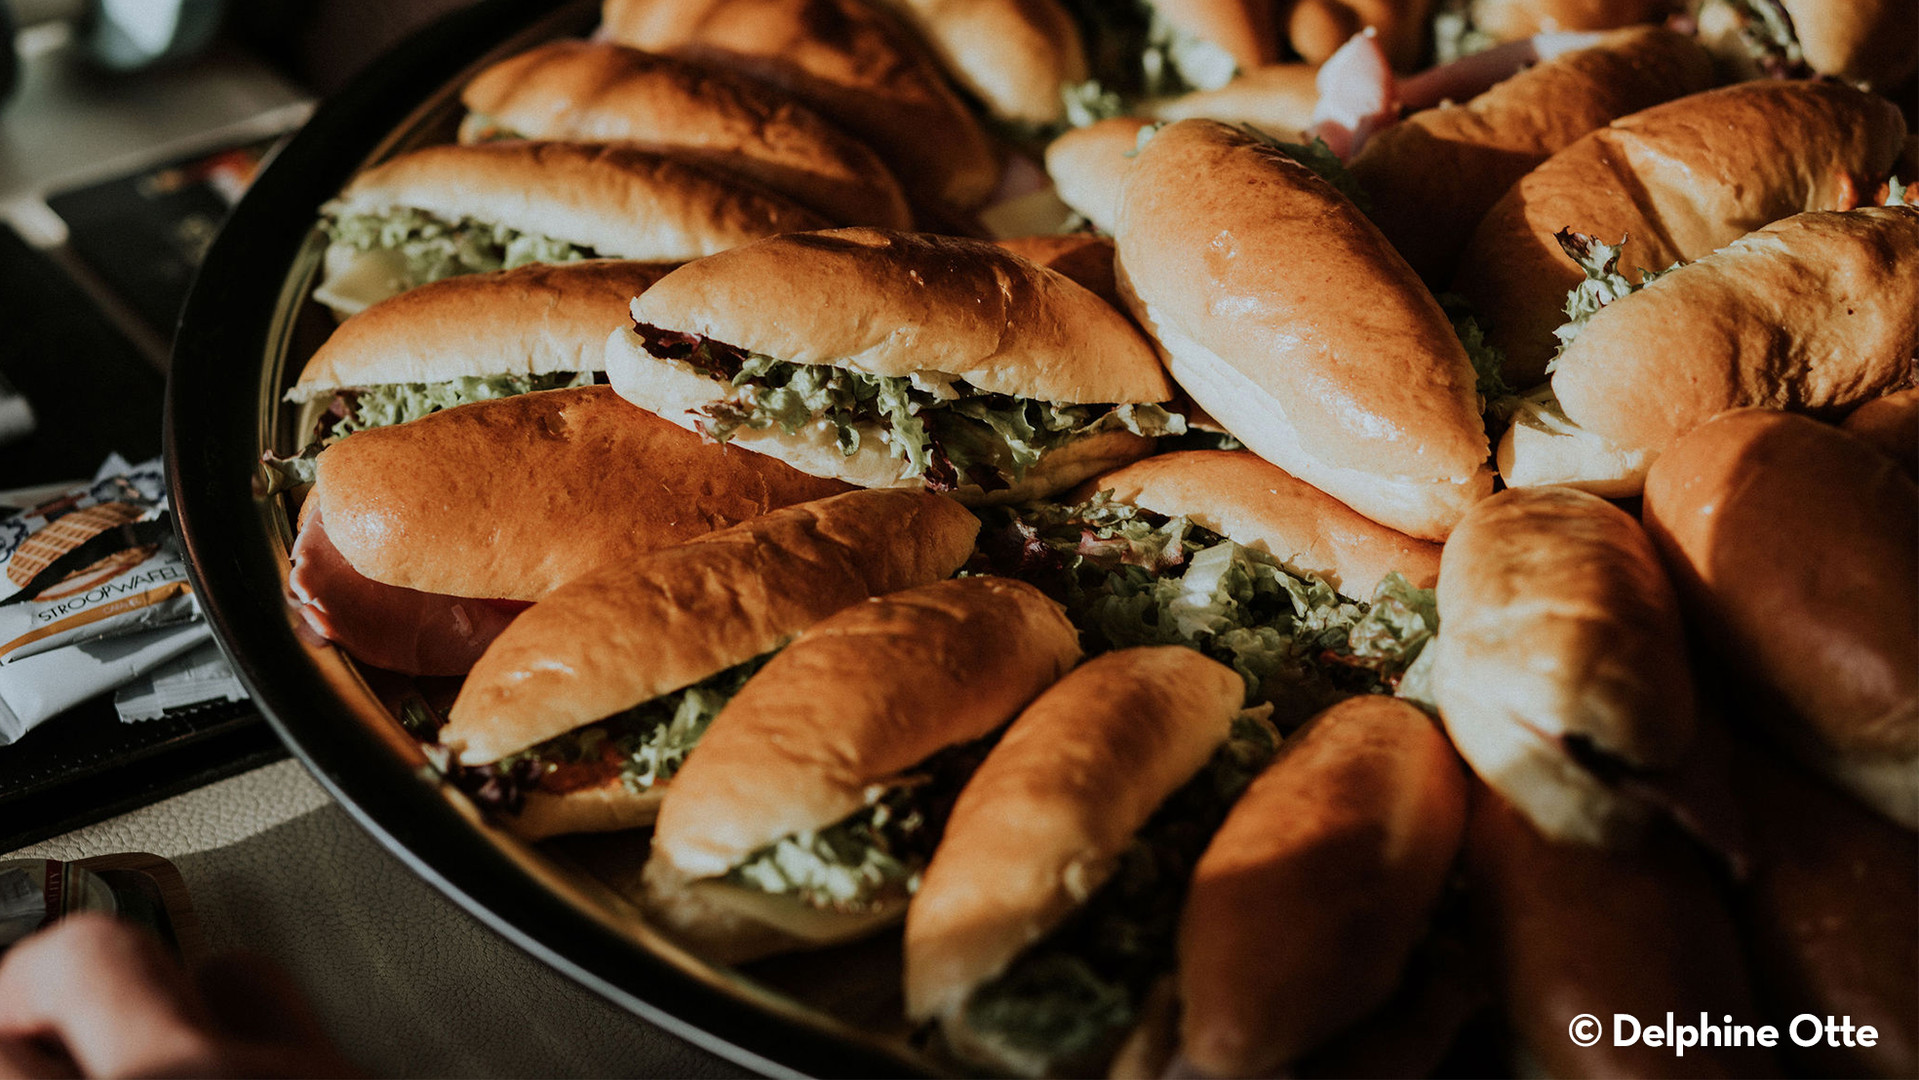 Sandwiches copyright.jpg